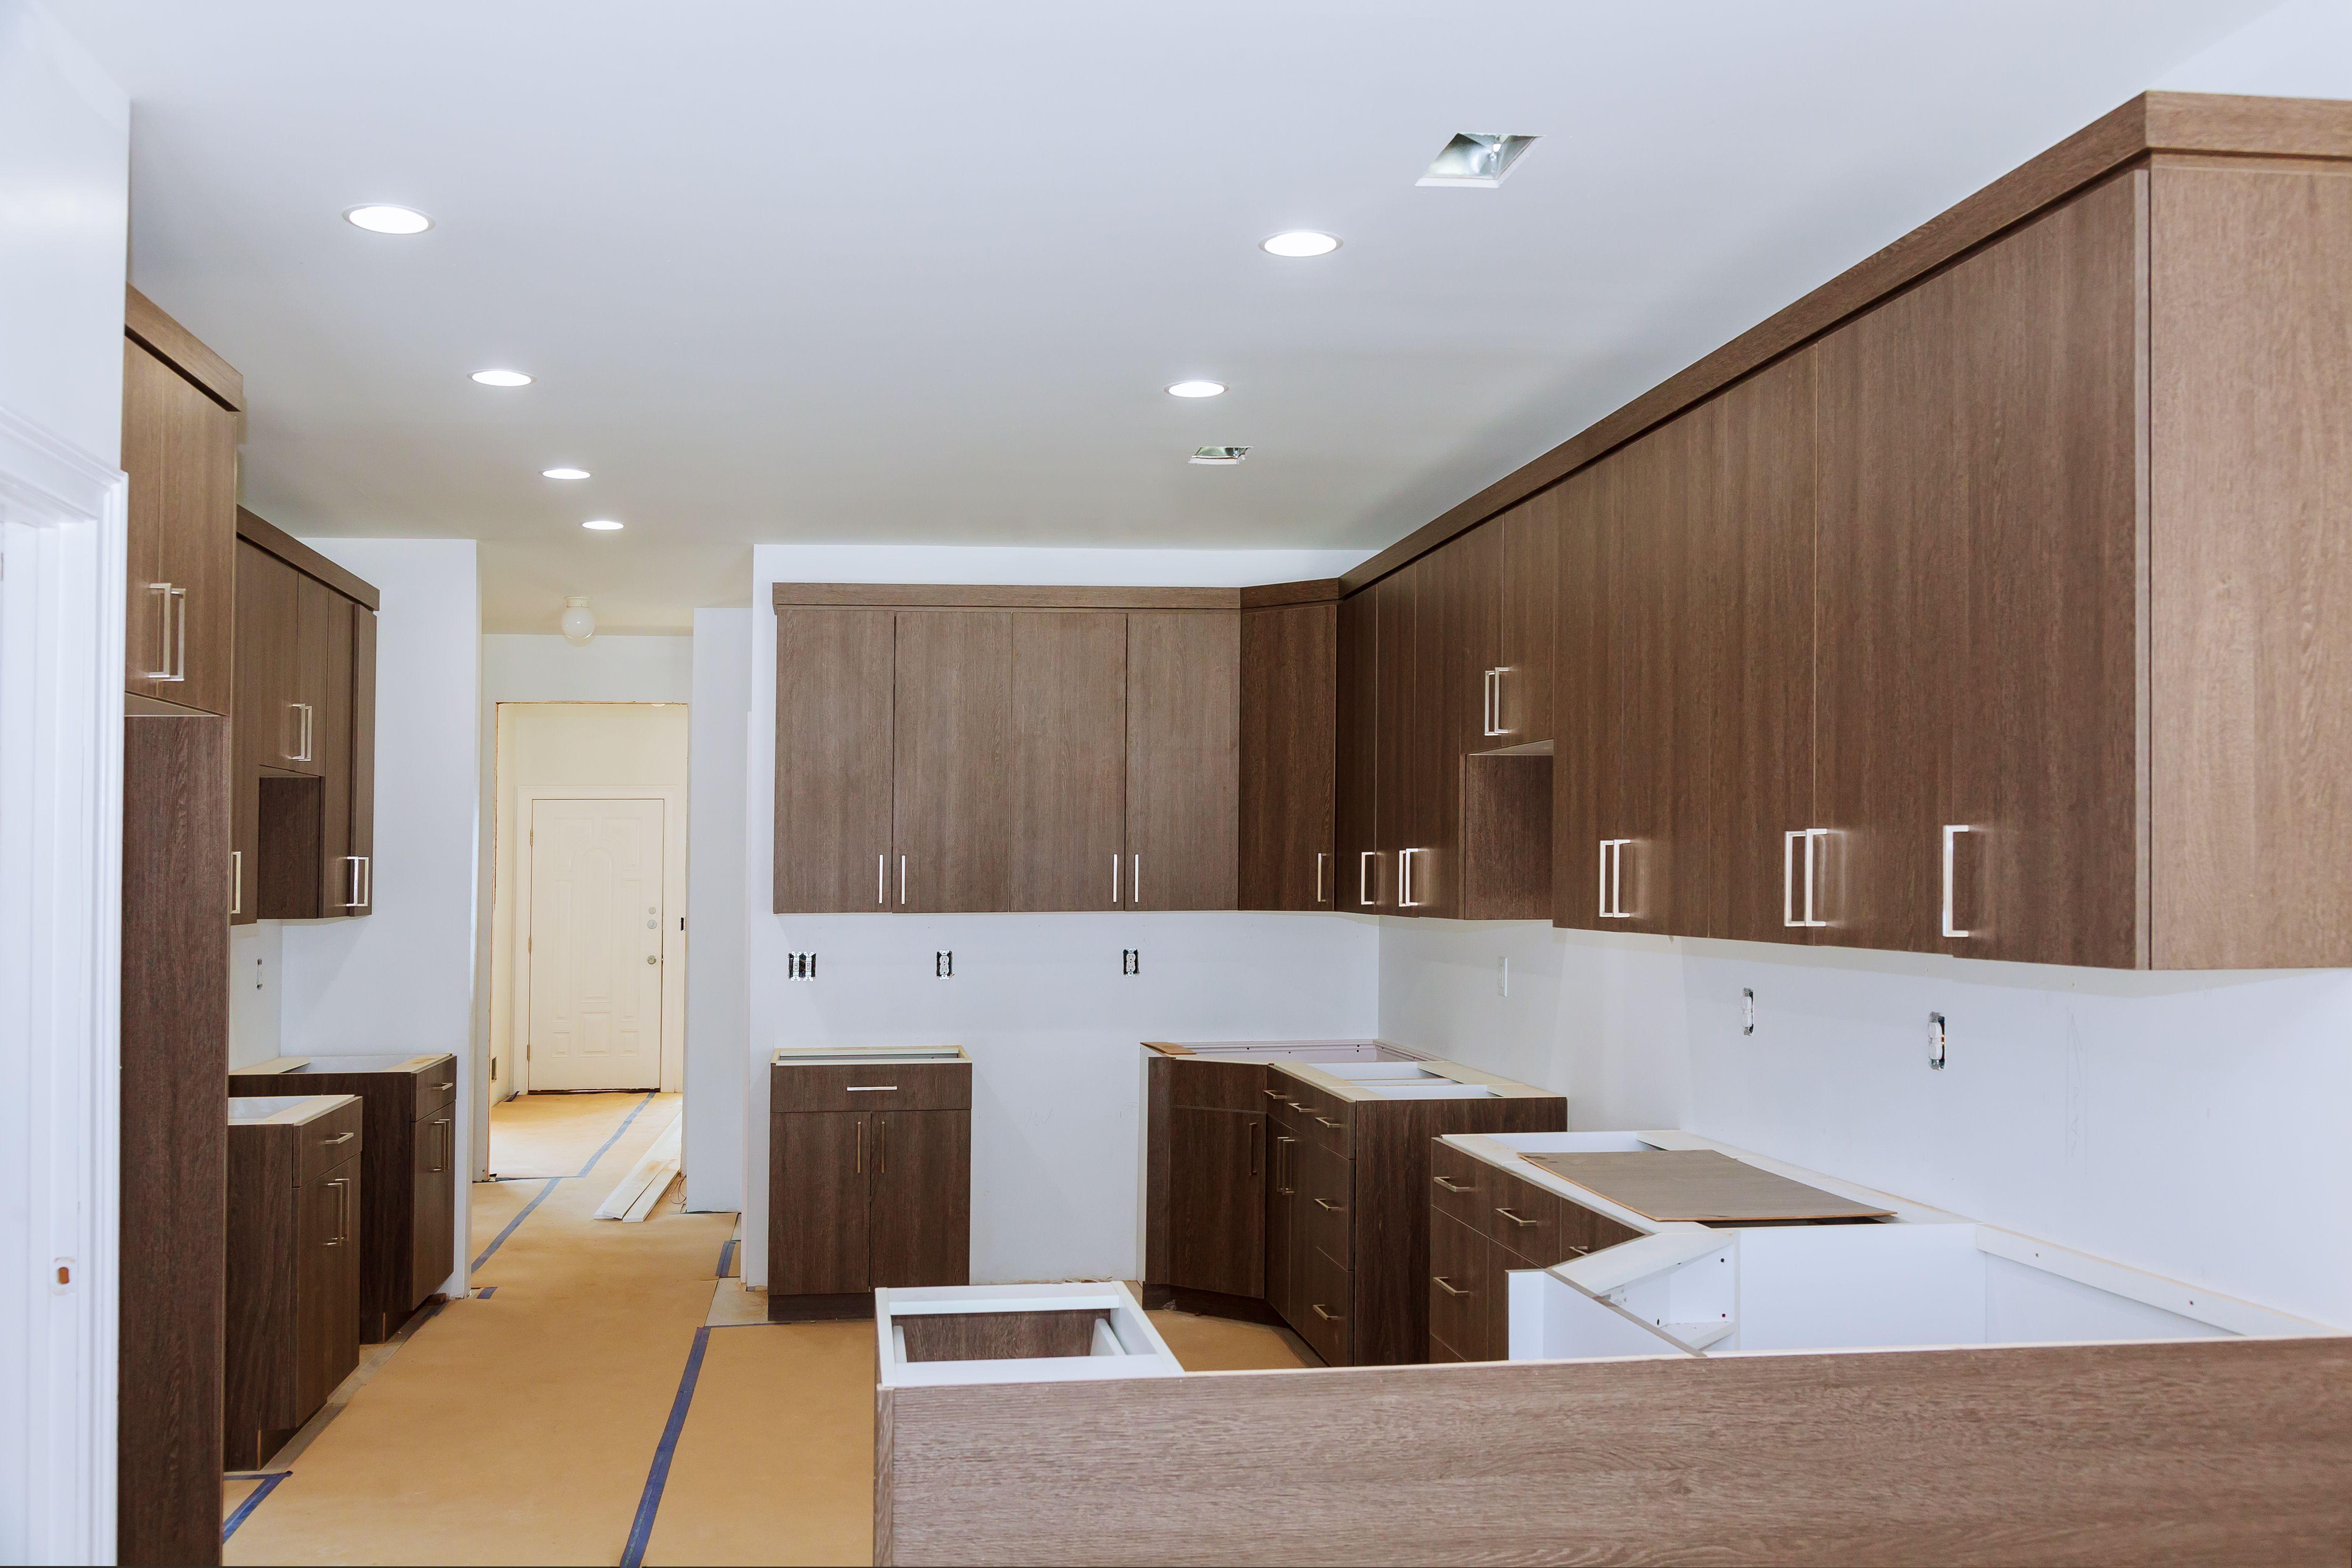 Assemble Kitchen Cabinets The Basics